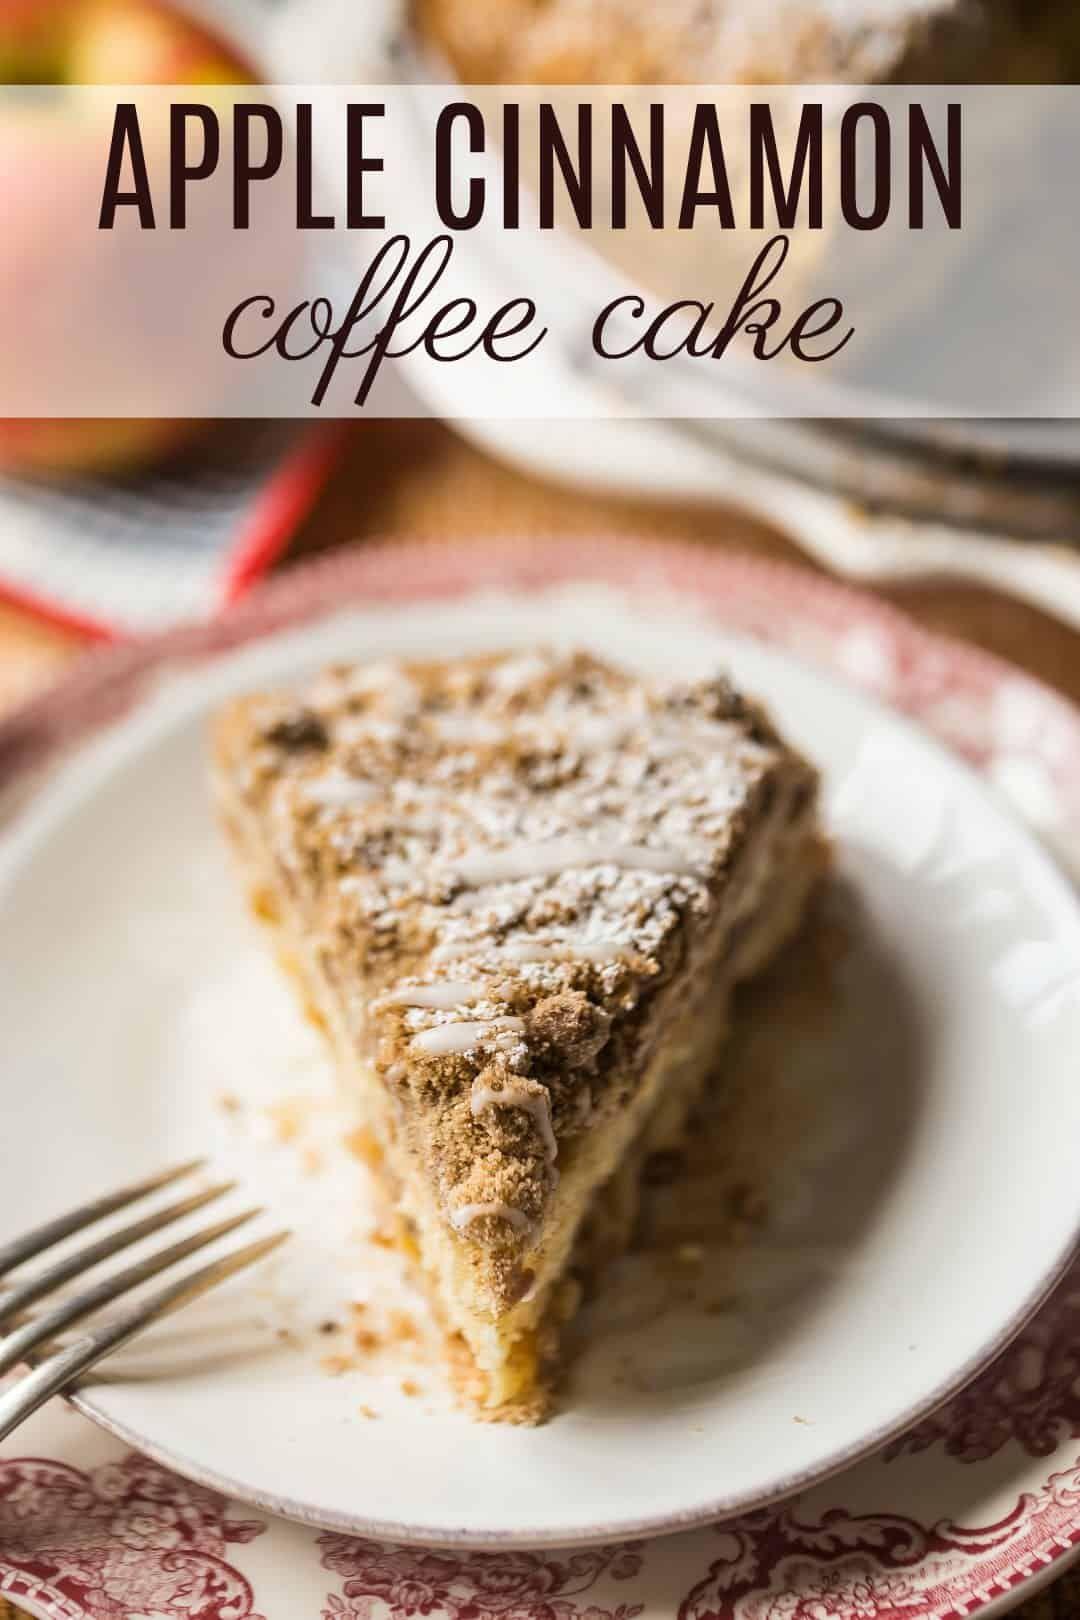 Apple Coffee Cake Moist Sour Cream Cake Layered With Juicy Apples Cinnamon Spiced Crumb Topping So Nice For Apple Coffee Cakes Coffee Cake Sour Cream Cake